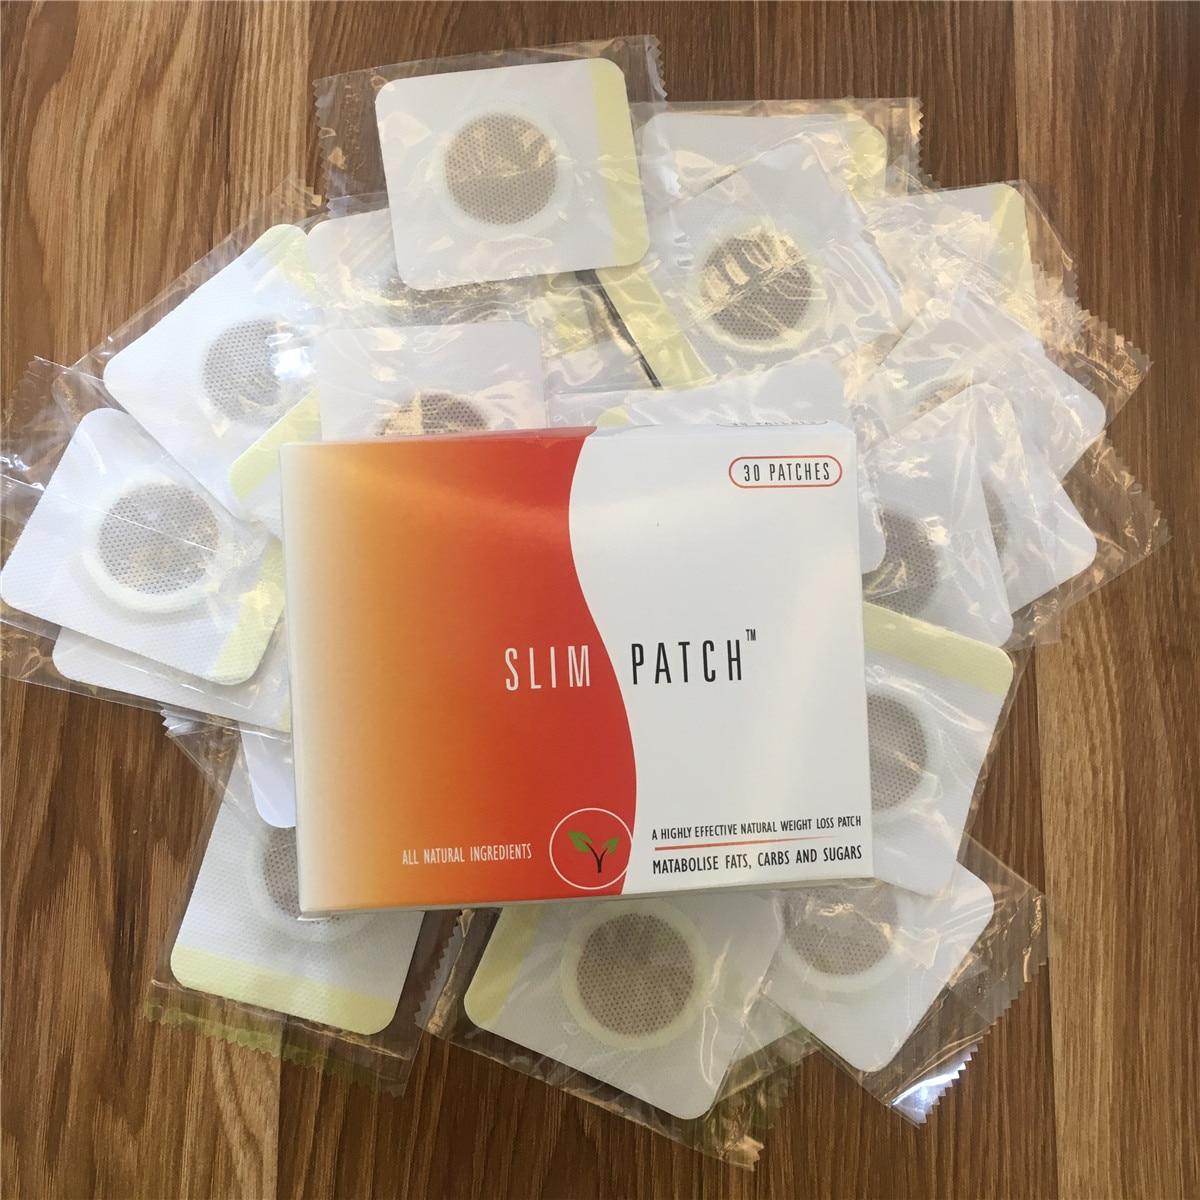 30 Pcs Traditionellen Chinesischen Medizin Abnehmen Nabel Aufkleber Dünne Patch Verlieren Gewicht Peelings & Körperbehandlungen